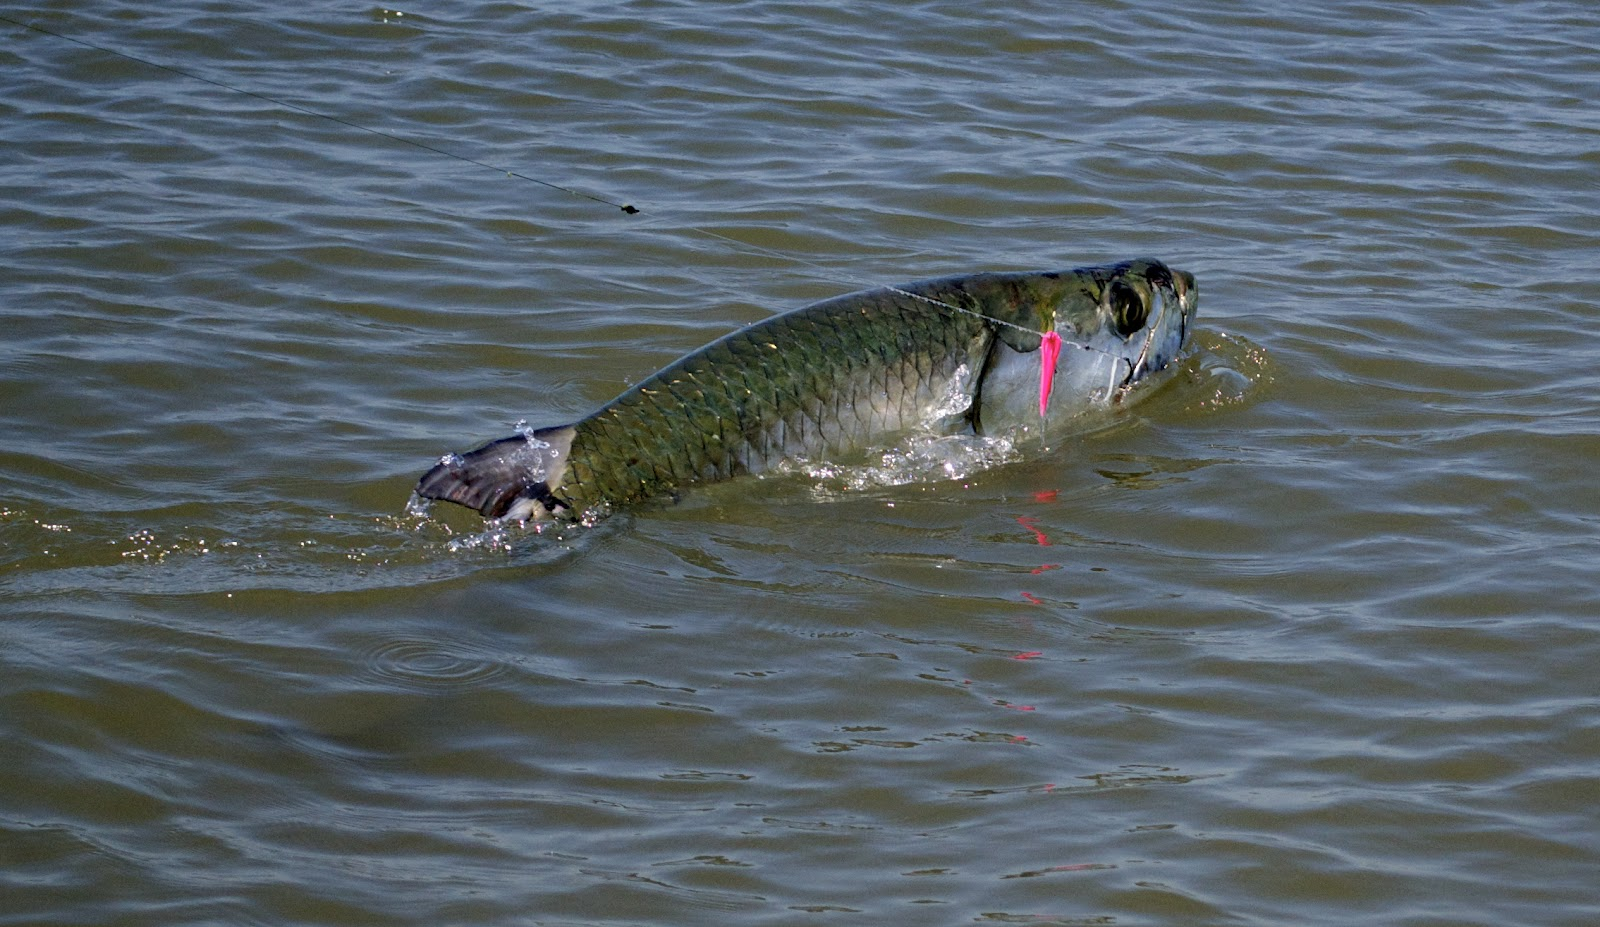 Carolina guide service winyah bay tarpon fishing report for Fishing in south carolina